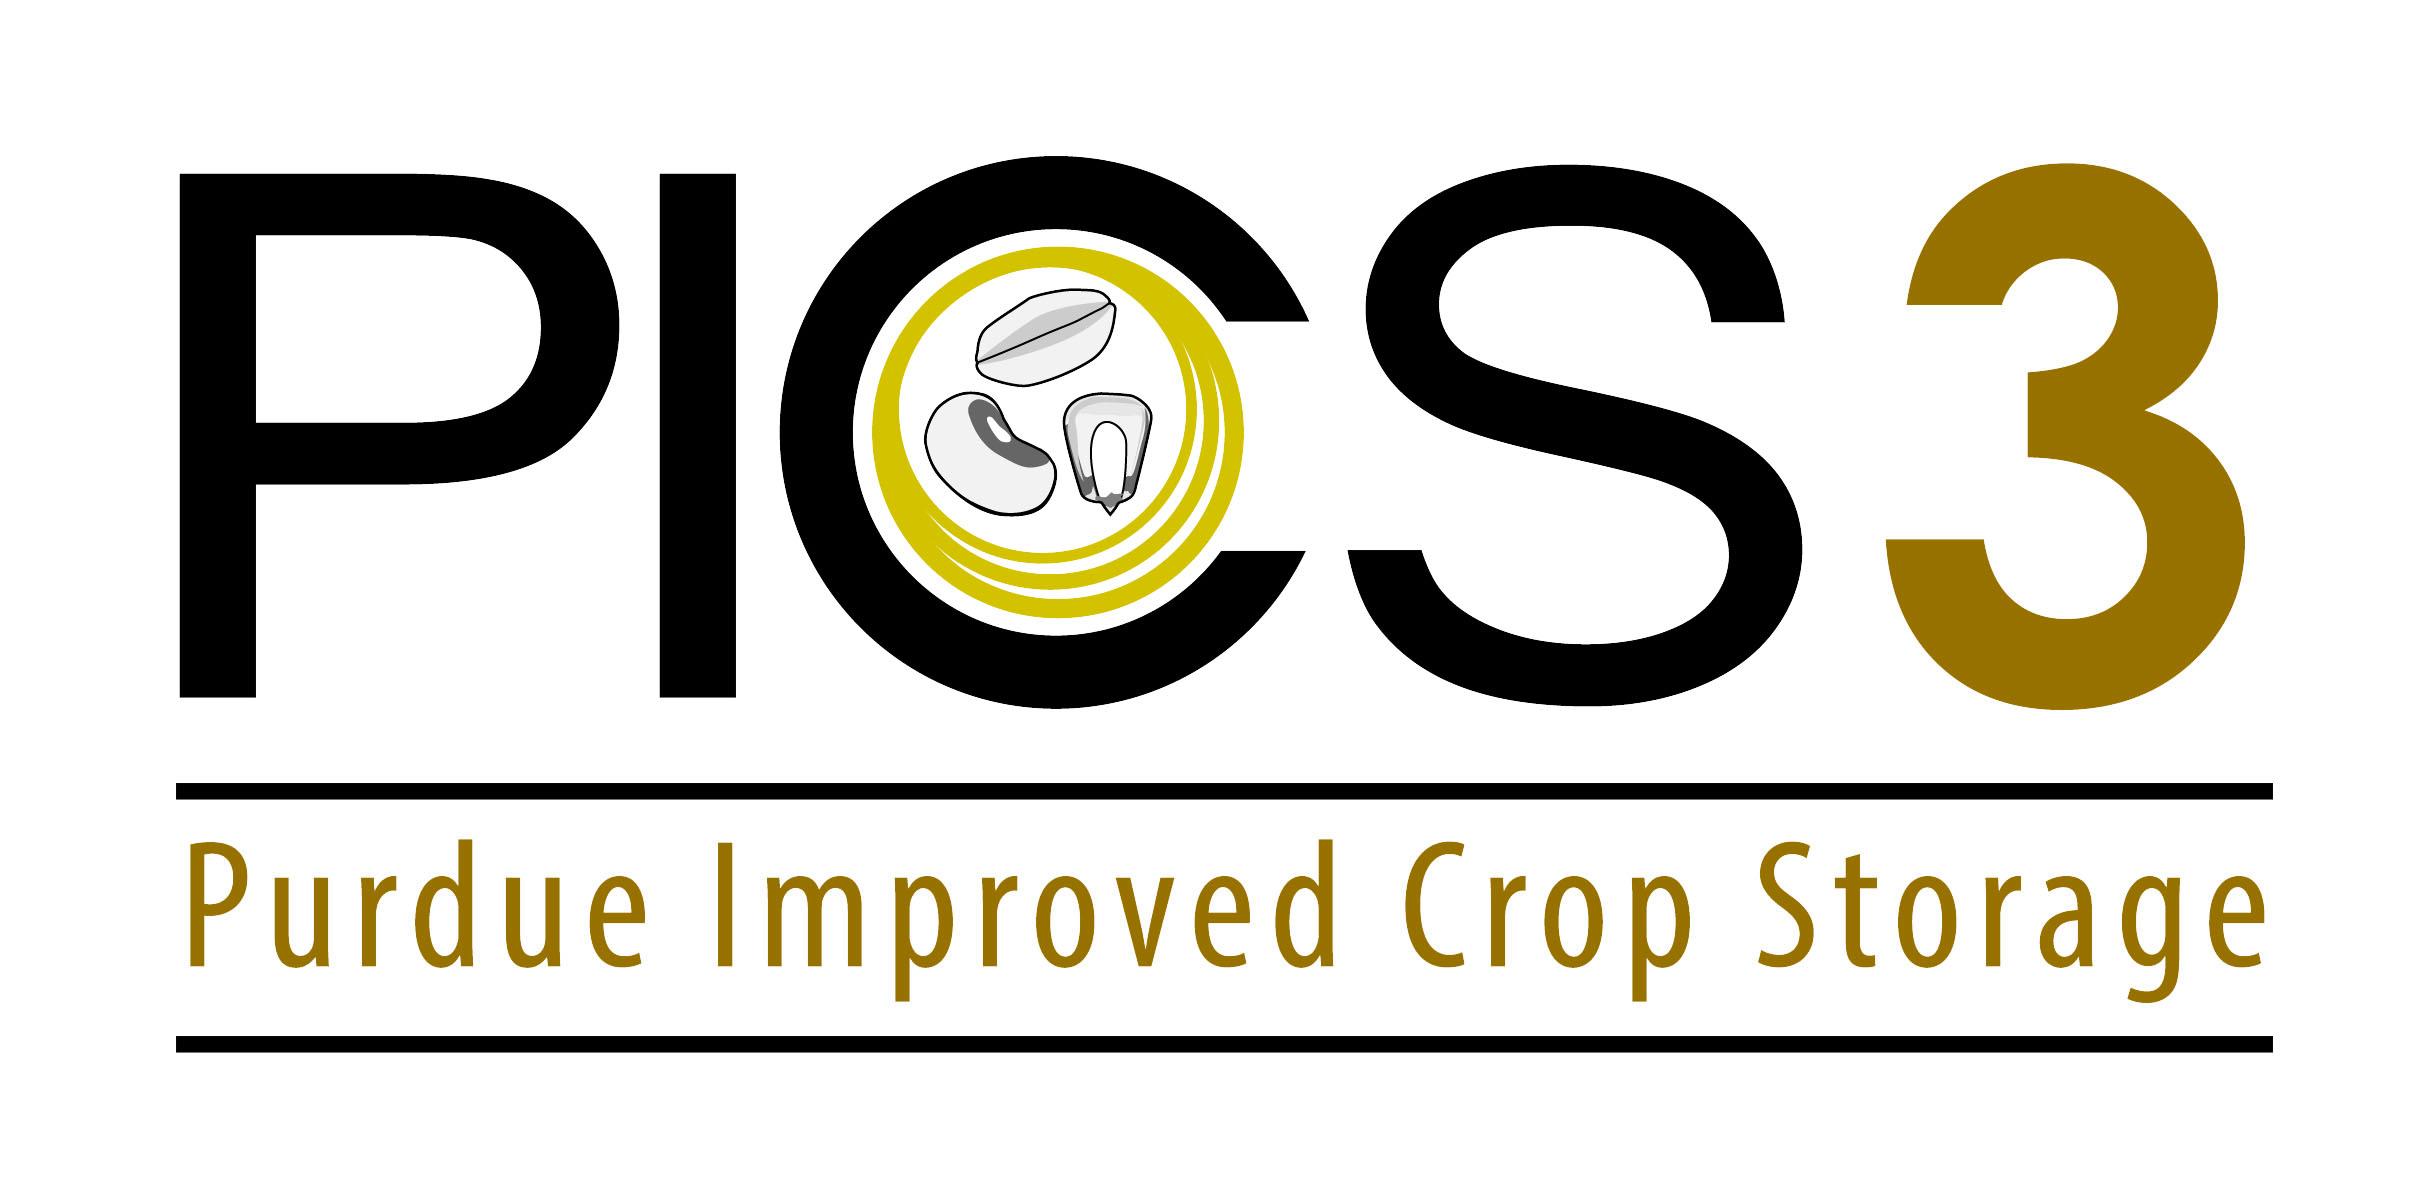 Pics3 Logo 2